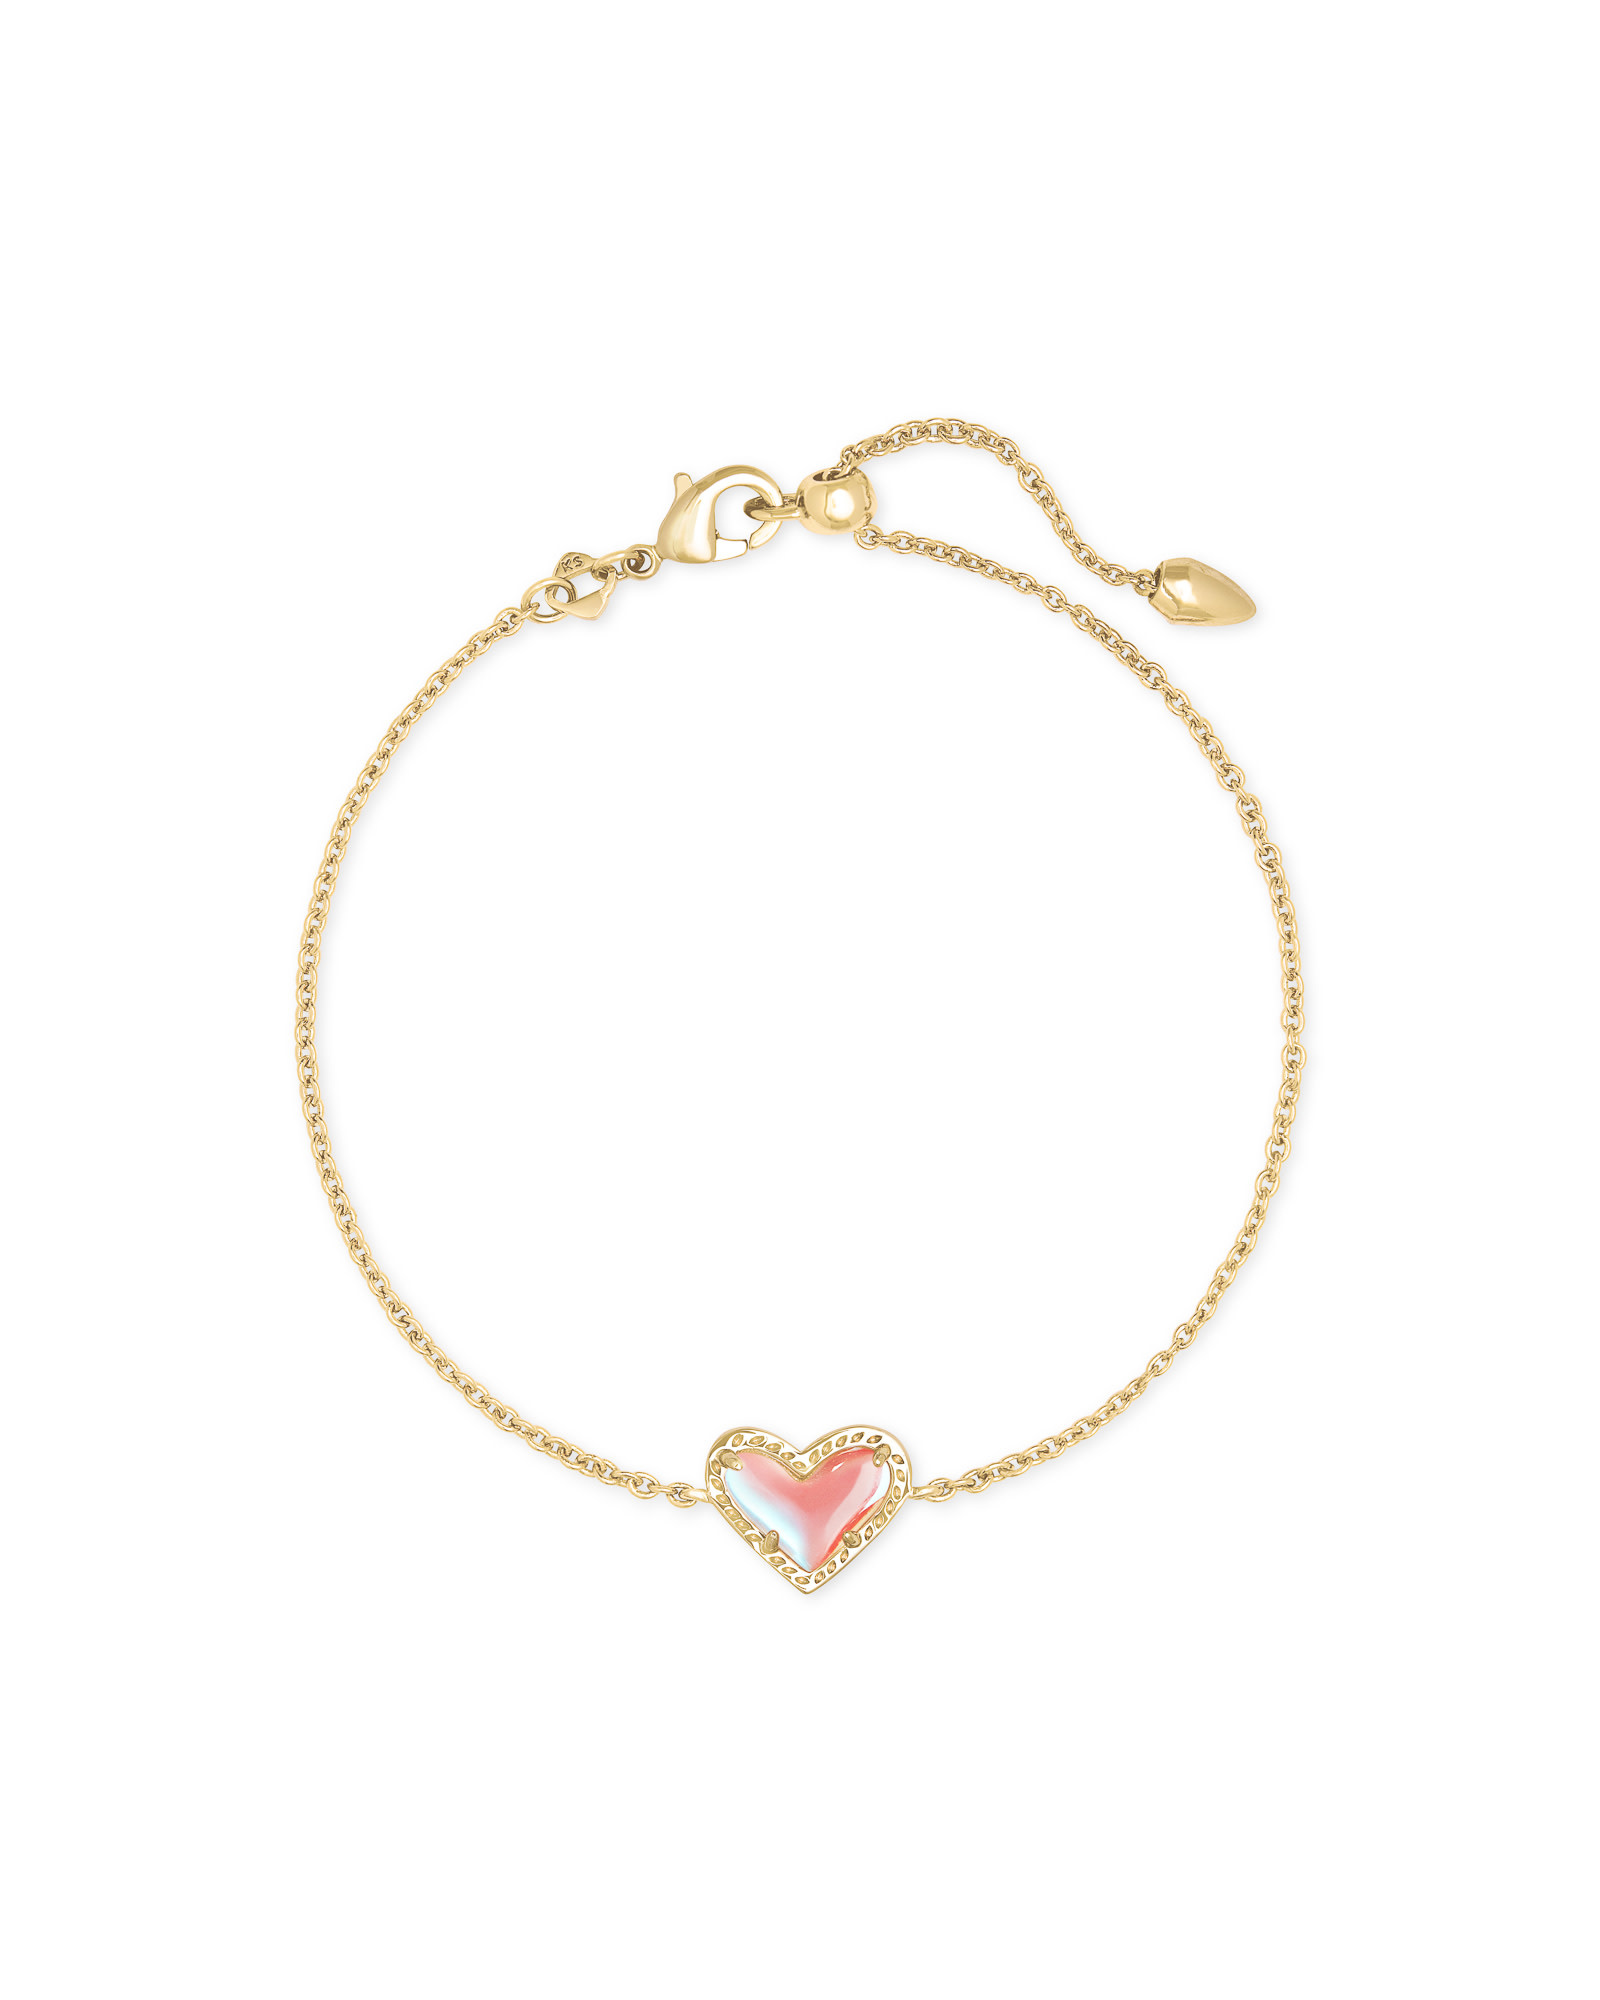 Ari Heart Delicate Bracelet